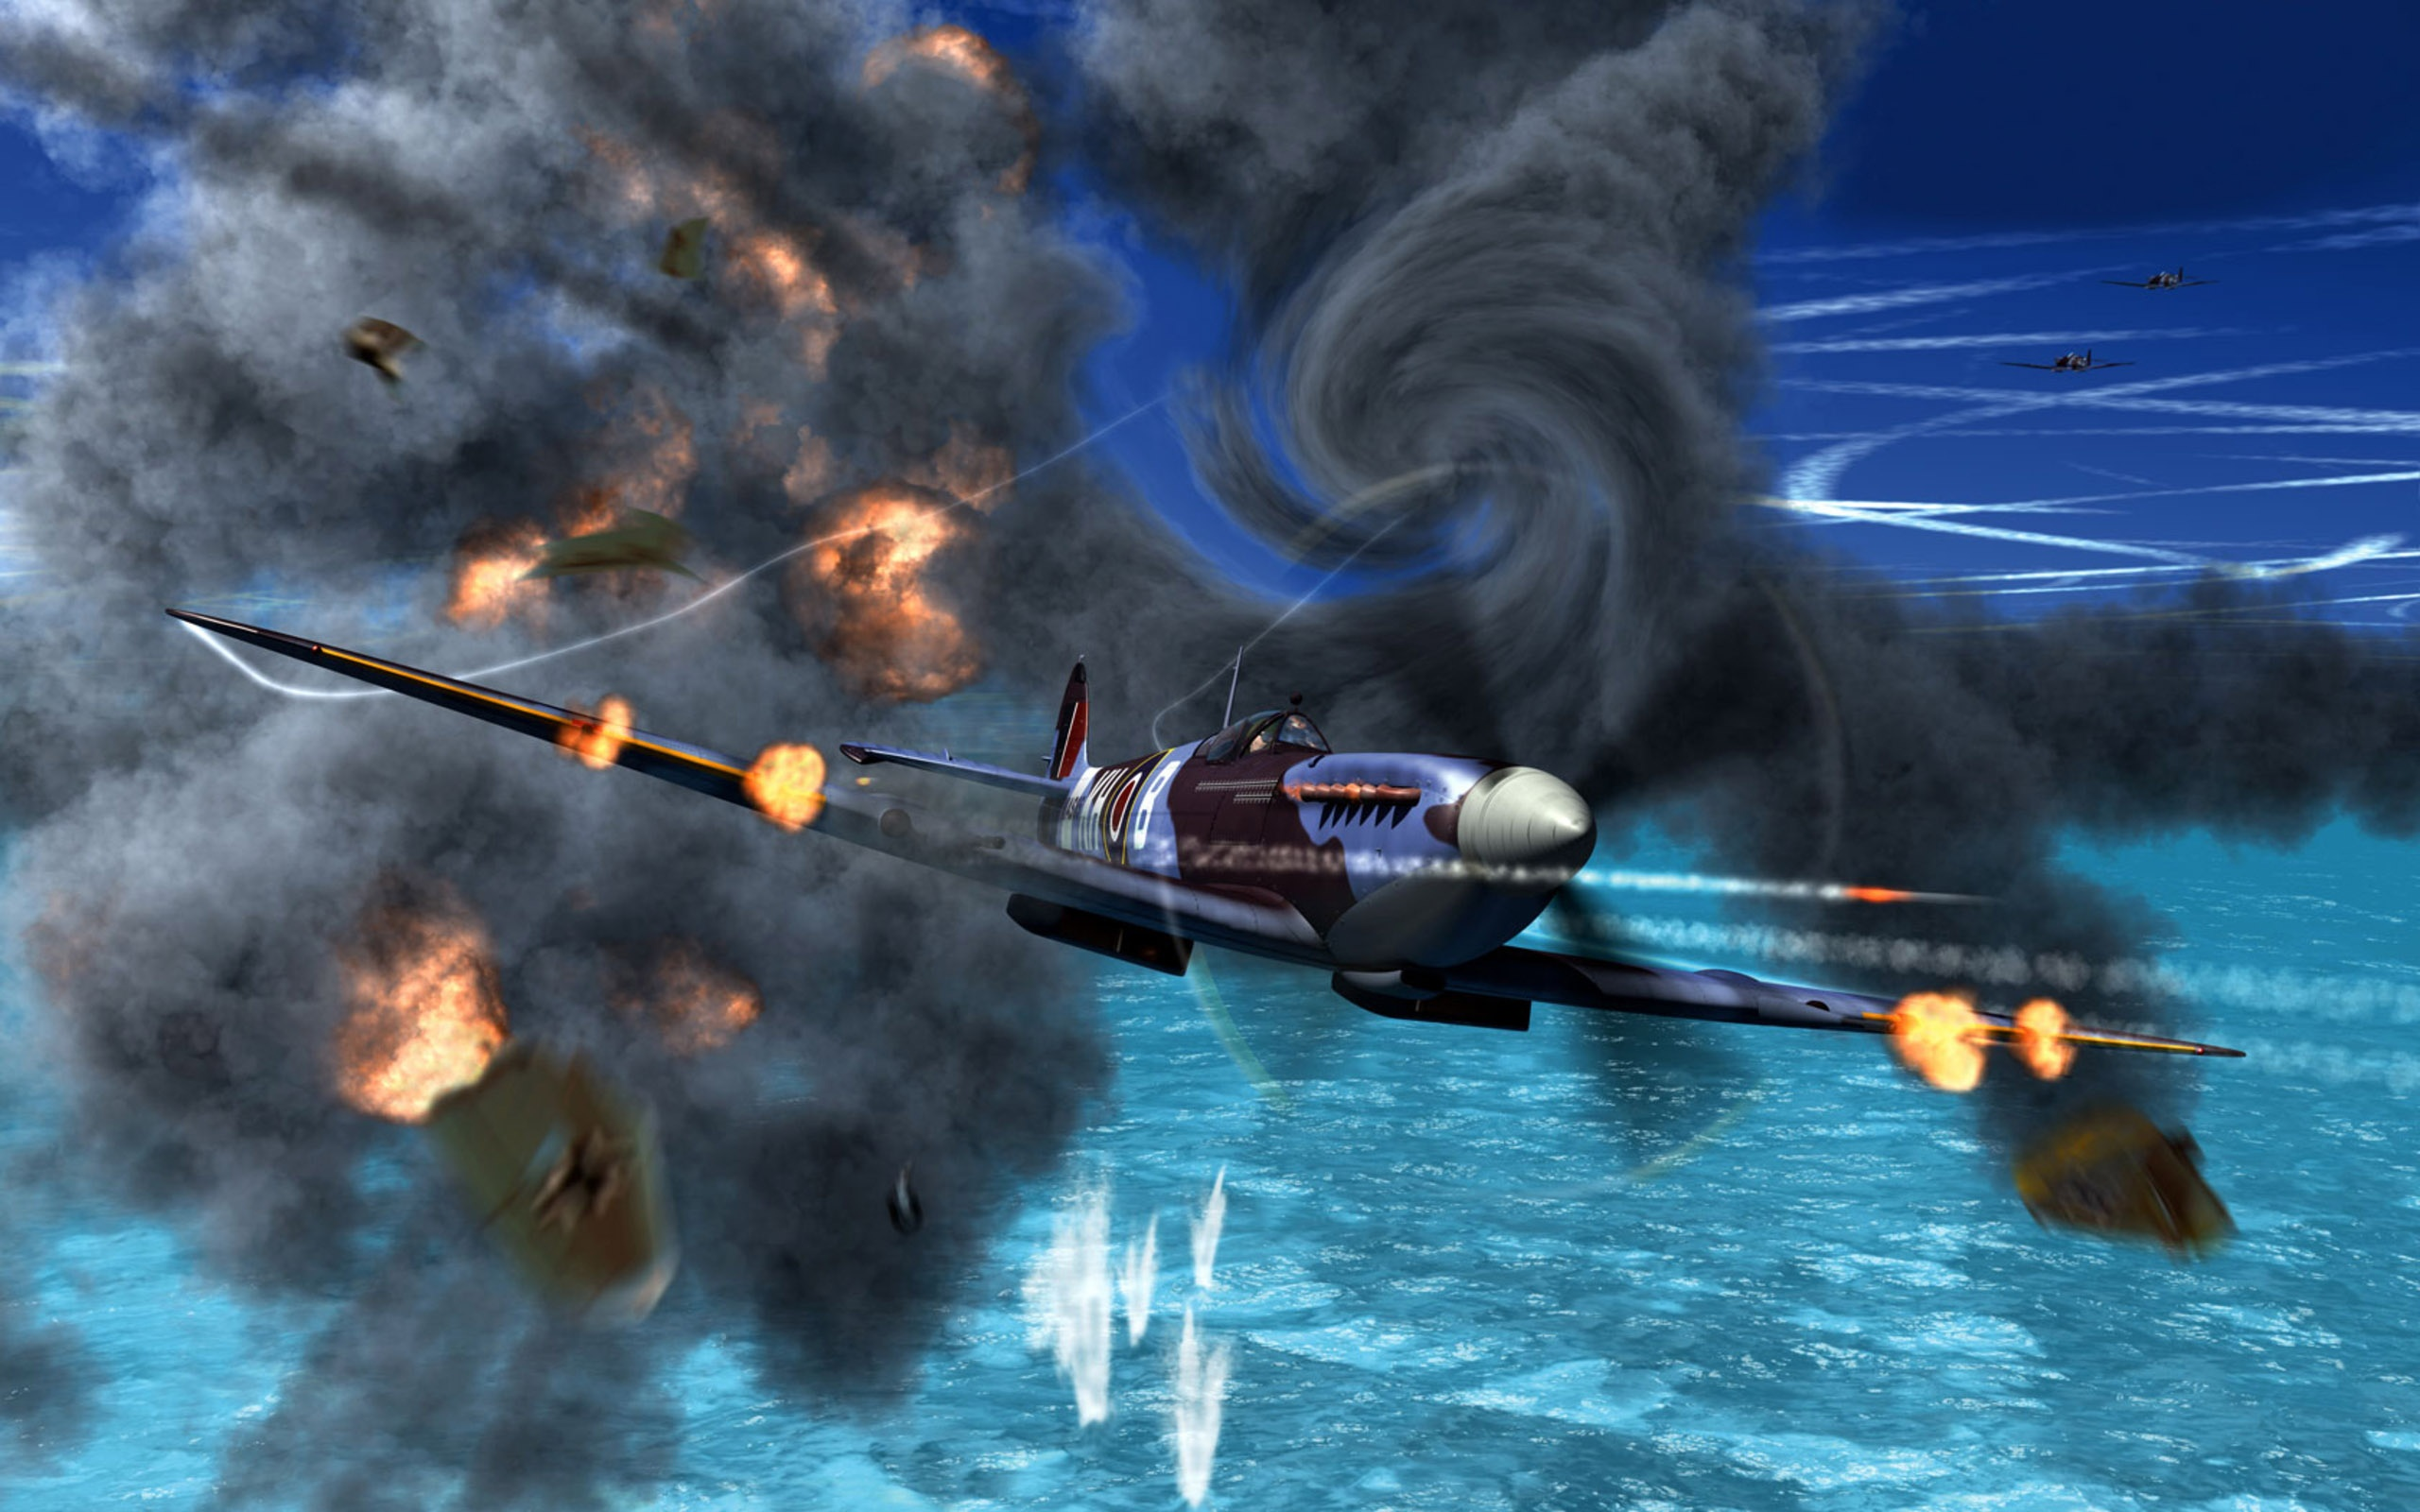 Supermarine Spitfire Wallpapers Supermarine Spitfire Backgrounds 2560x1600